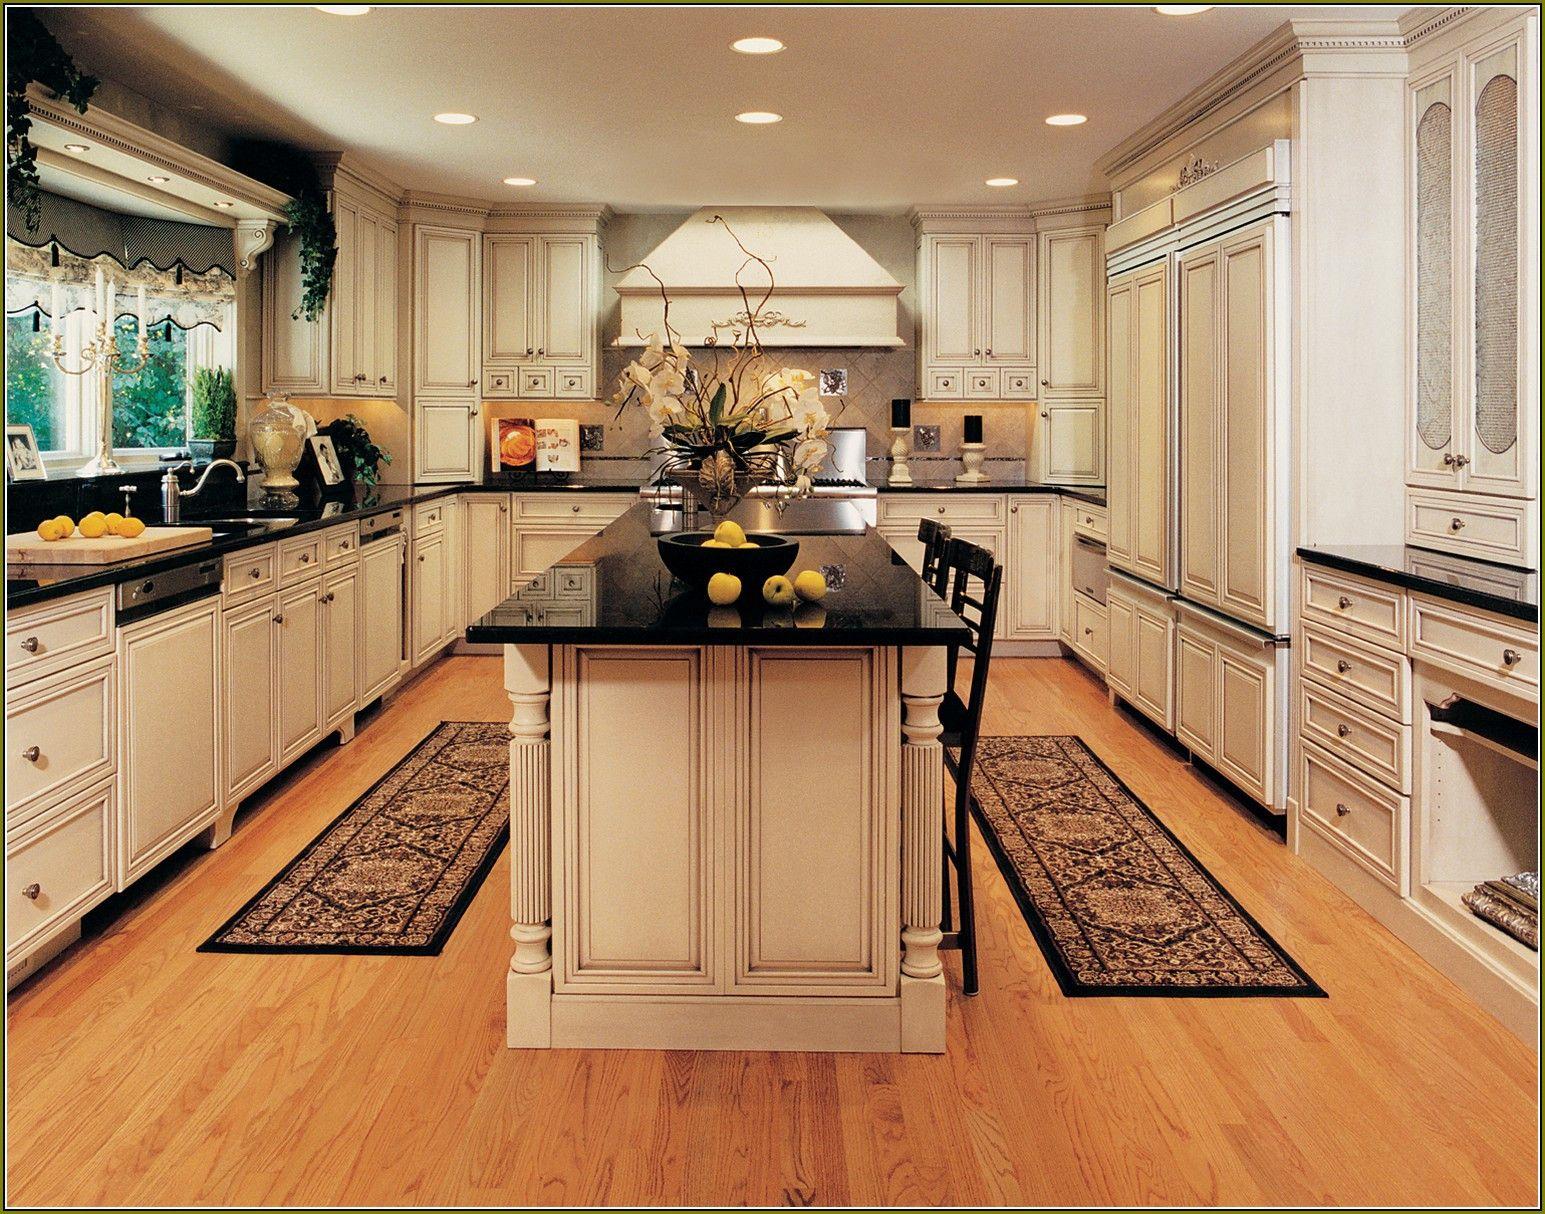 Best Kitchen Gallery: 55 Quaker Maid Kitchen Cabi S Small Kitchen Island Ideas With of Quaker Maid Kitchen Cabinets on rachelxblog.com